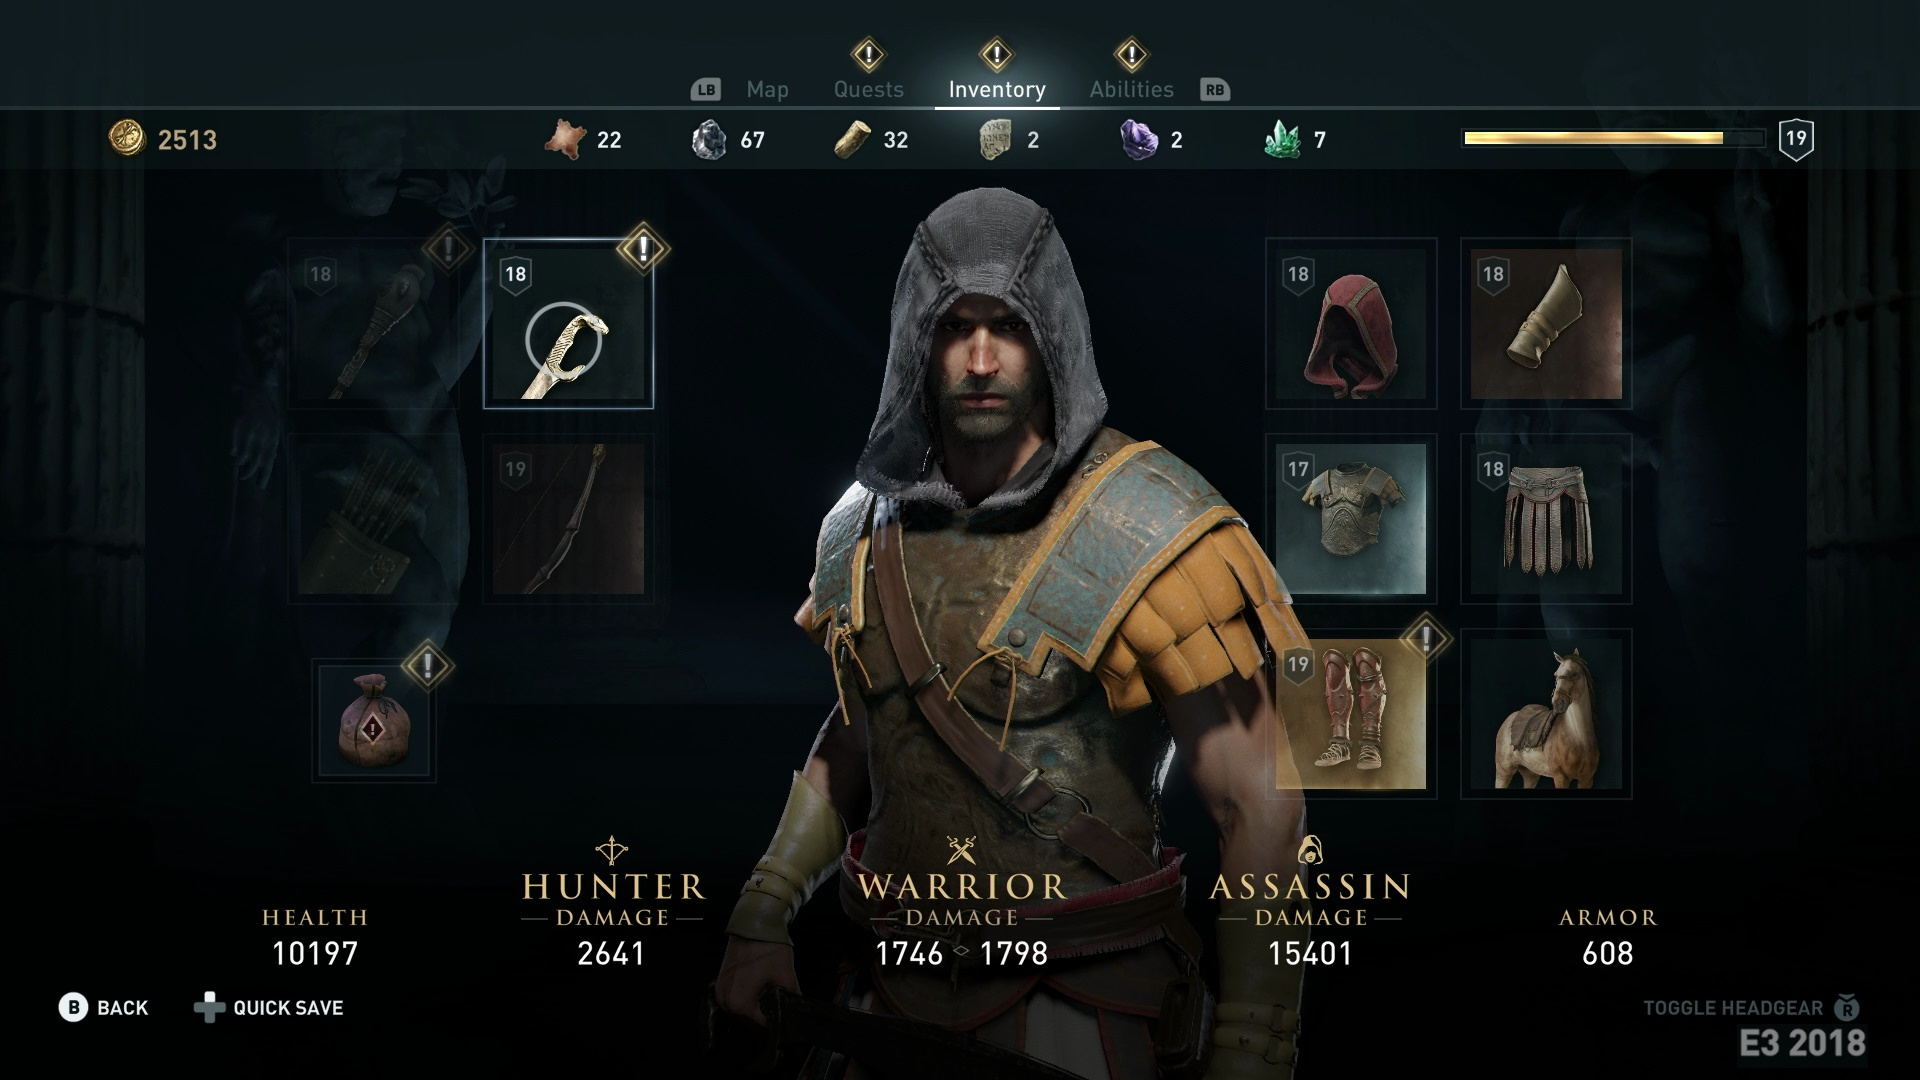 Assassins Creed Odyssey Leak 8